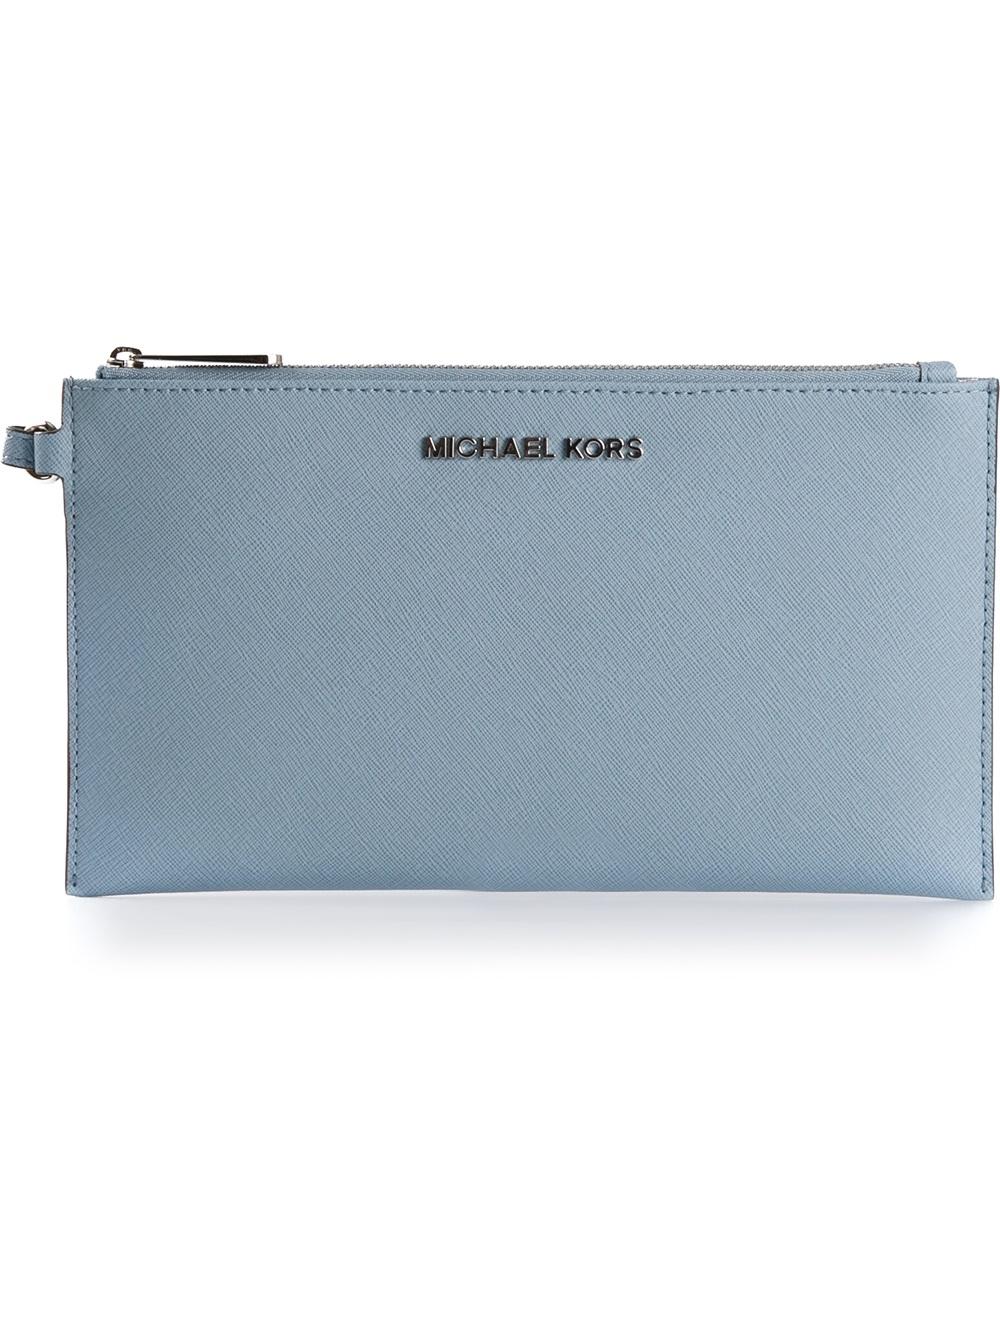 33d1e3be95fb MICHAEL Michael Kors Zipped Clutch Bag in Blue - Lyst